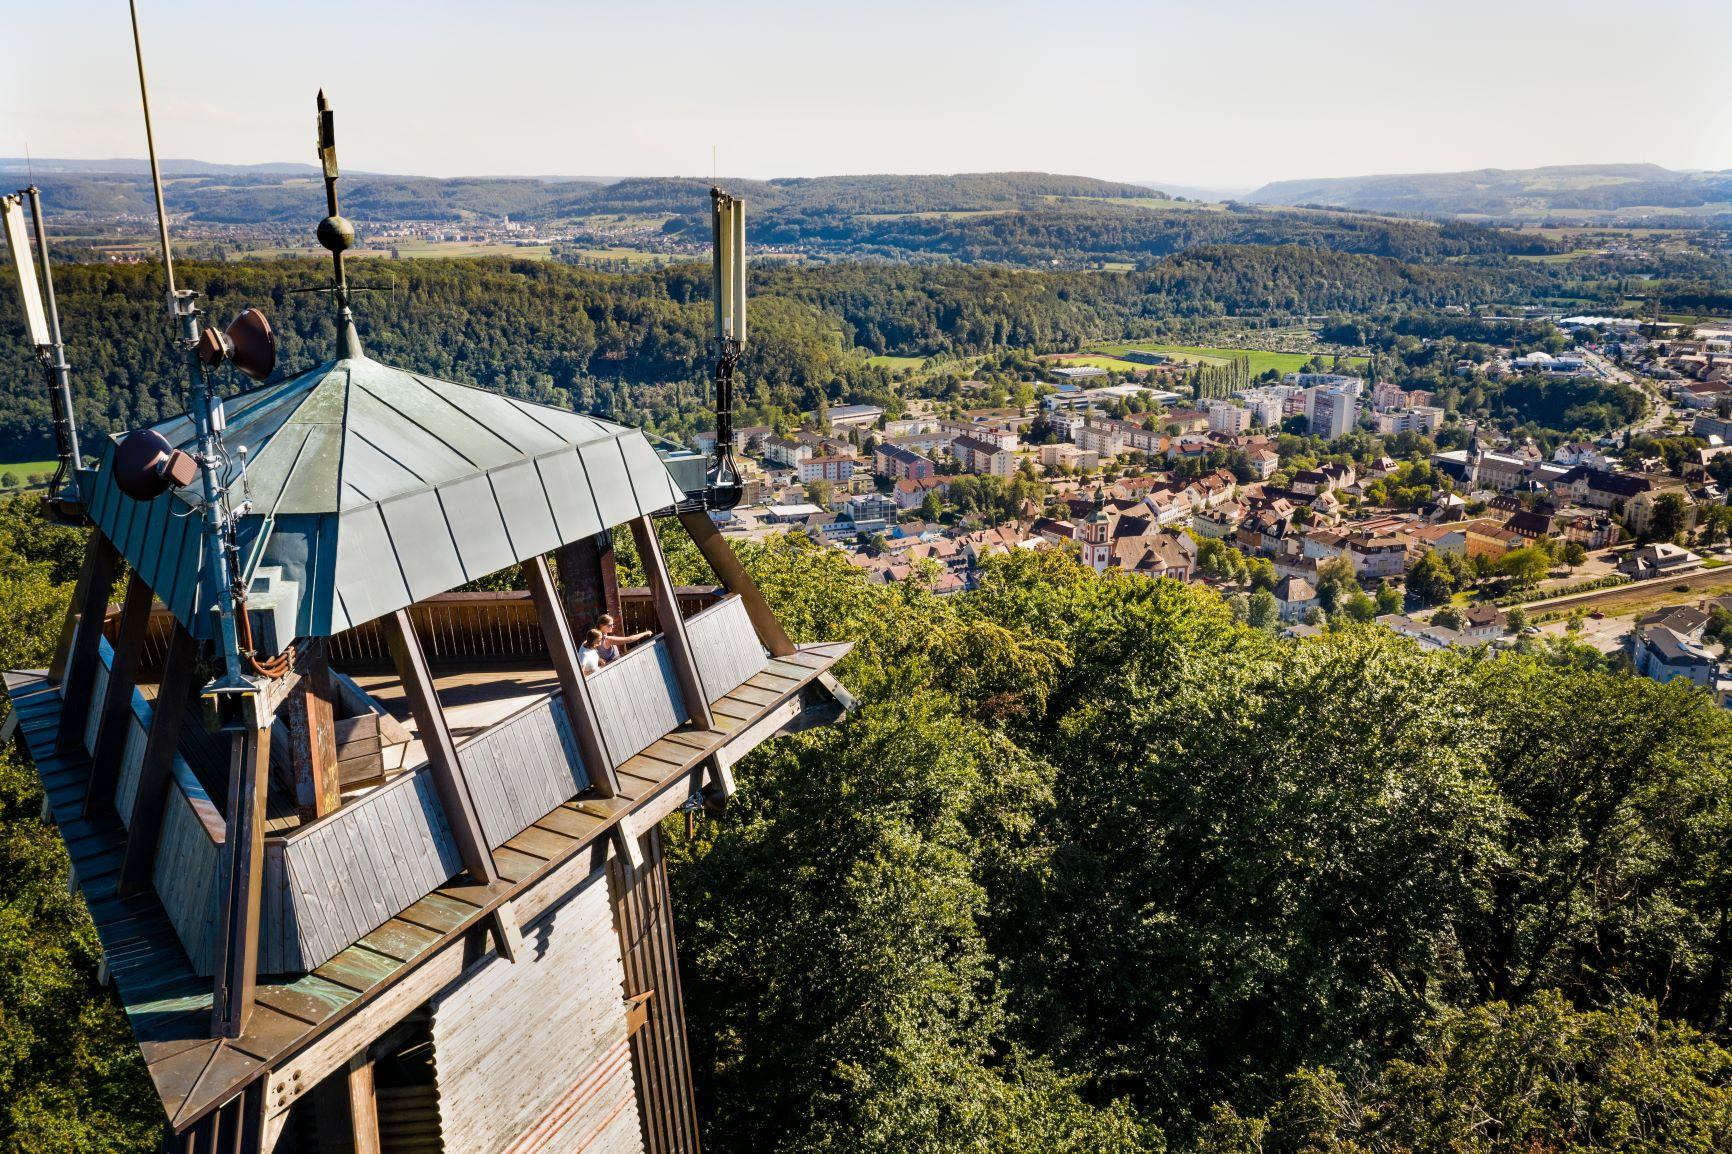 Vitibuckturm, Waldshut-Tiengen, Südschwarzwald, Schwarzwald, Turm, Landschaft, Sonne, Sommer, Winter, Herbst, Frühling, Natur, Stadt, Aussichtsturm, Aussicht, Aussichtsplattform